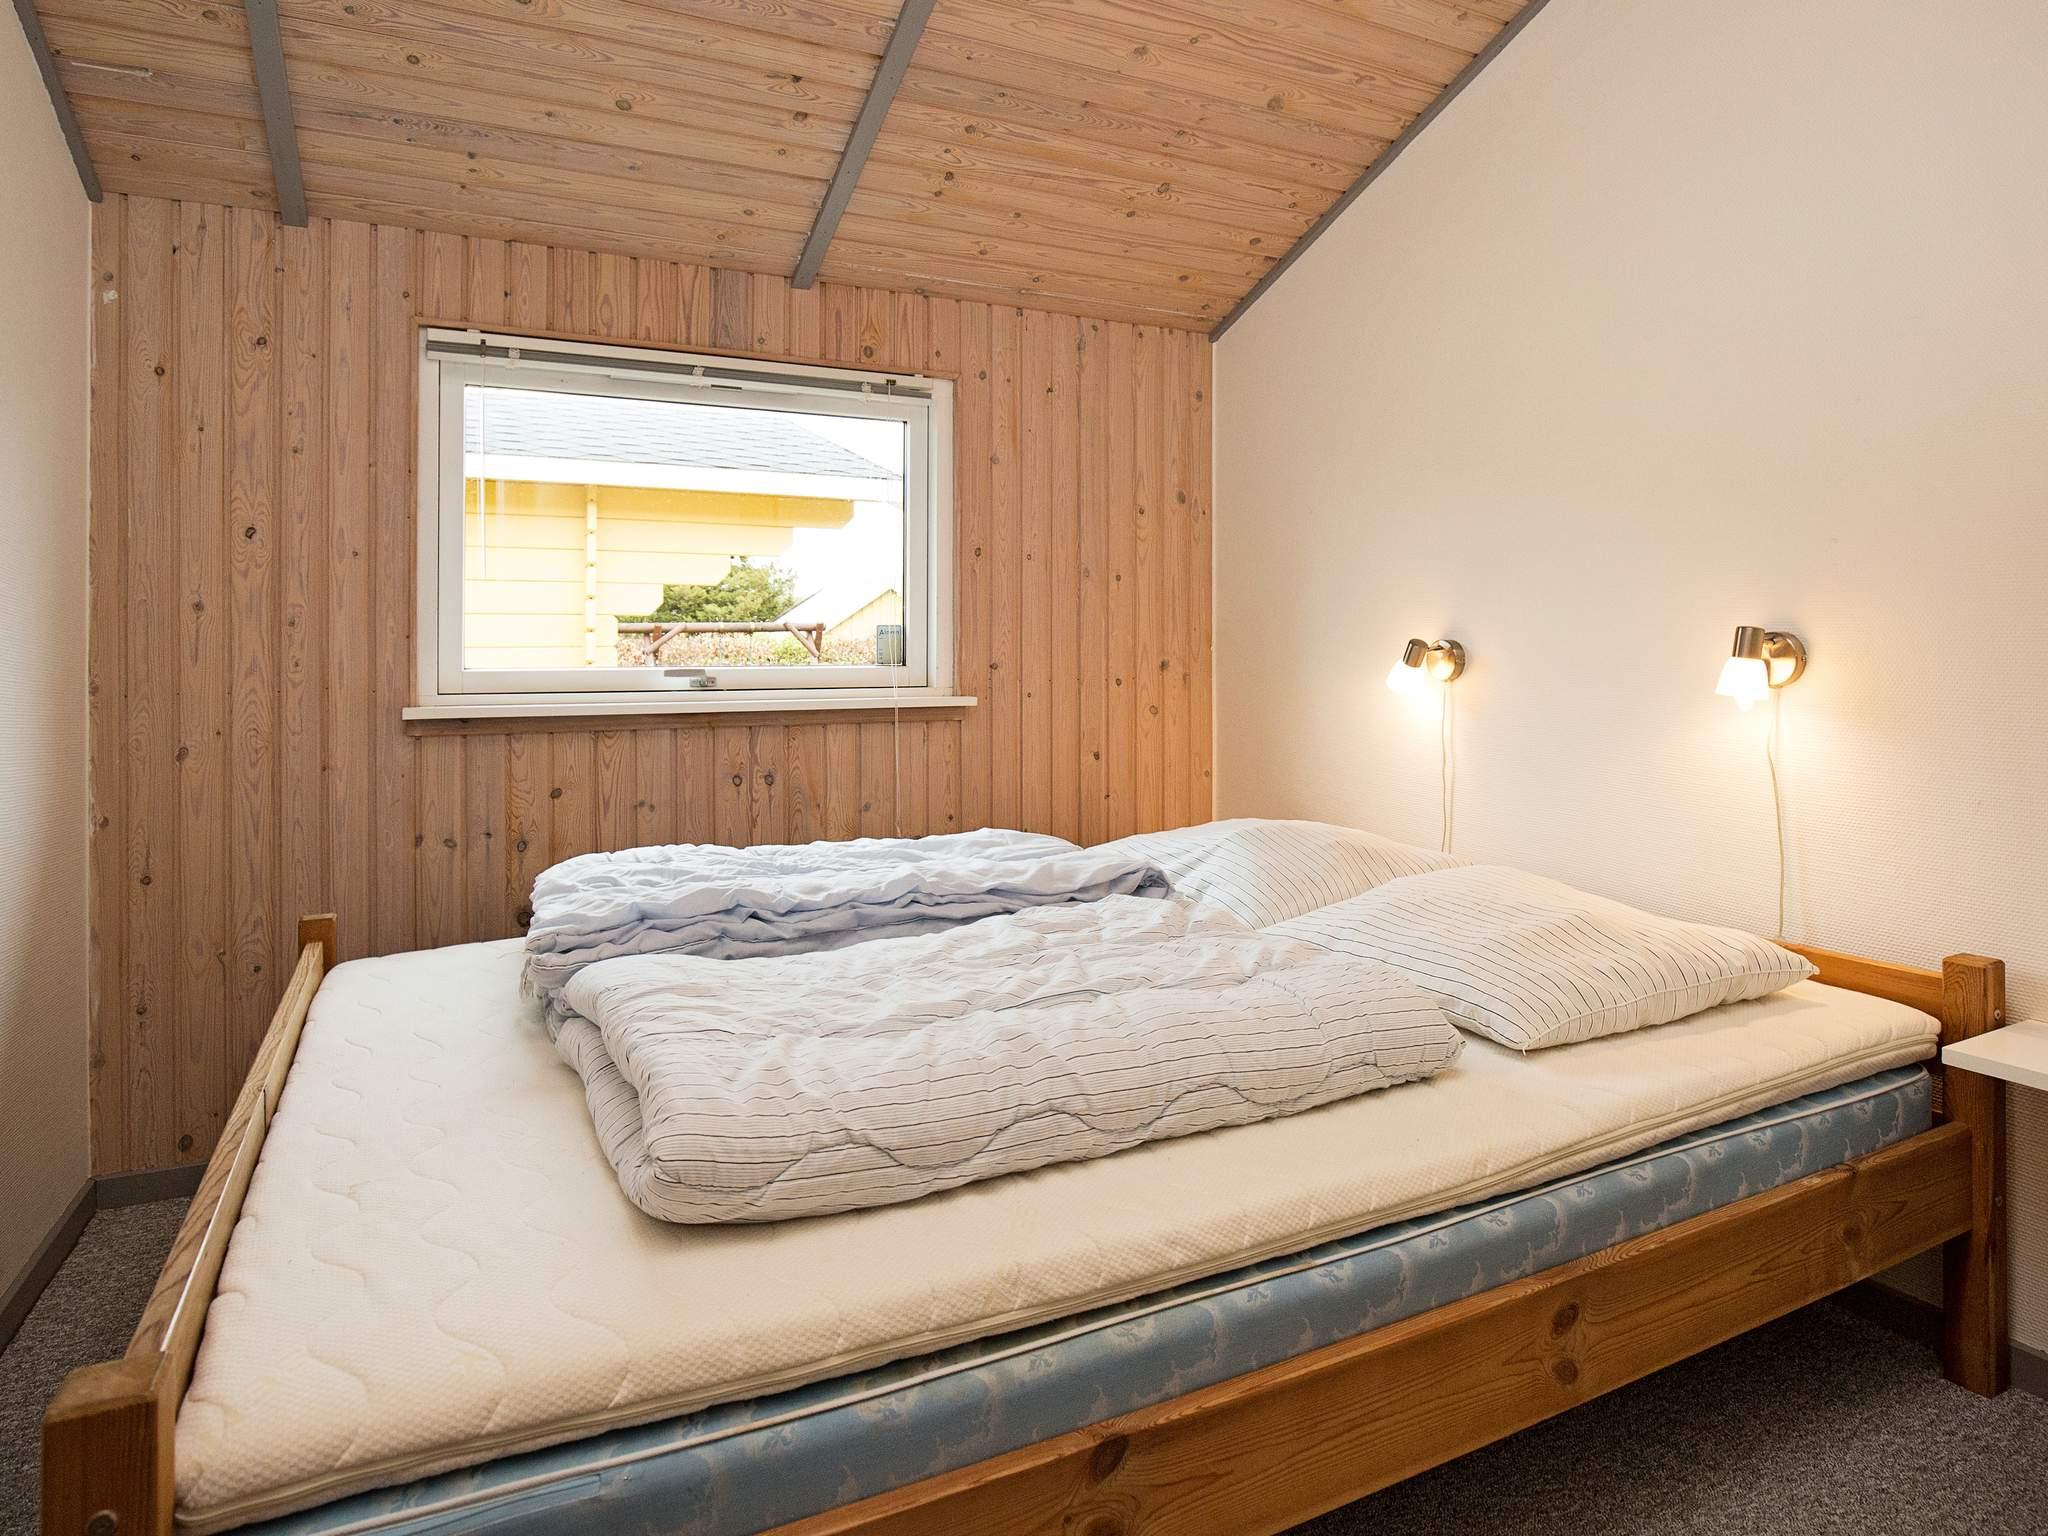 Ferienhaus Råbylille Strand (428716), Råbylille, , Møn, Dänemark, Bild 6